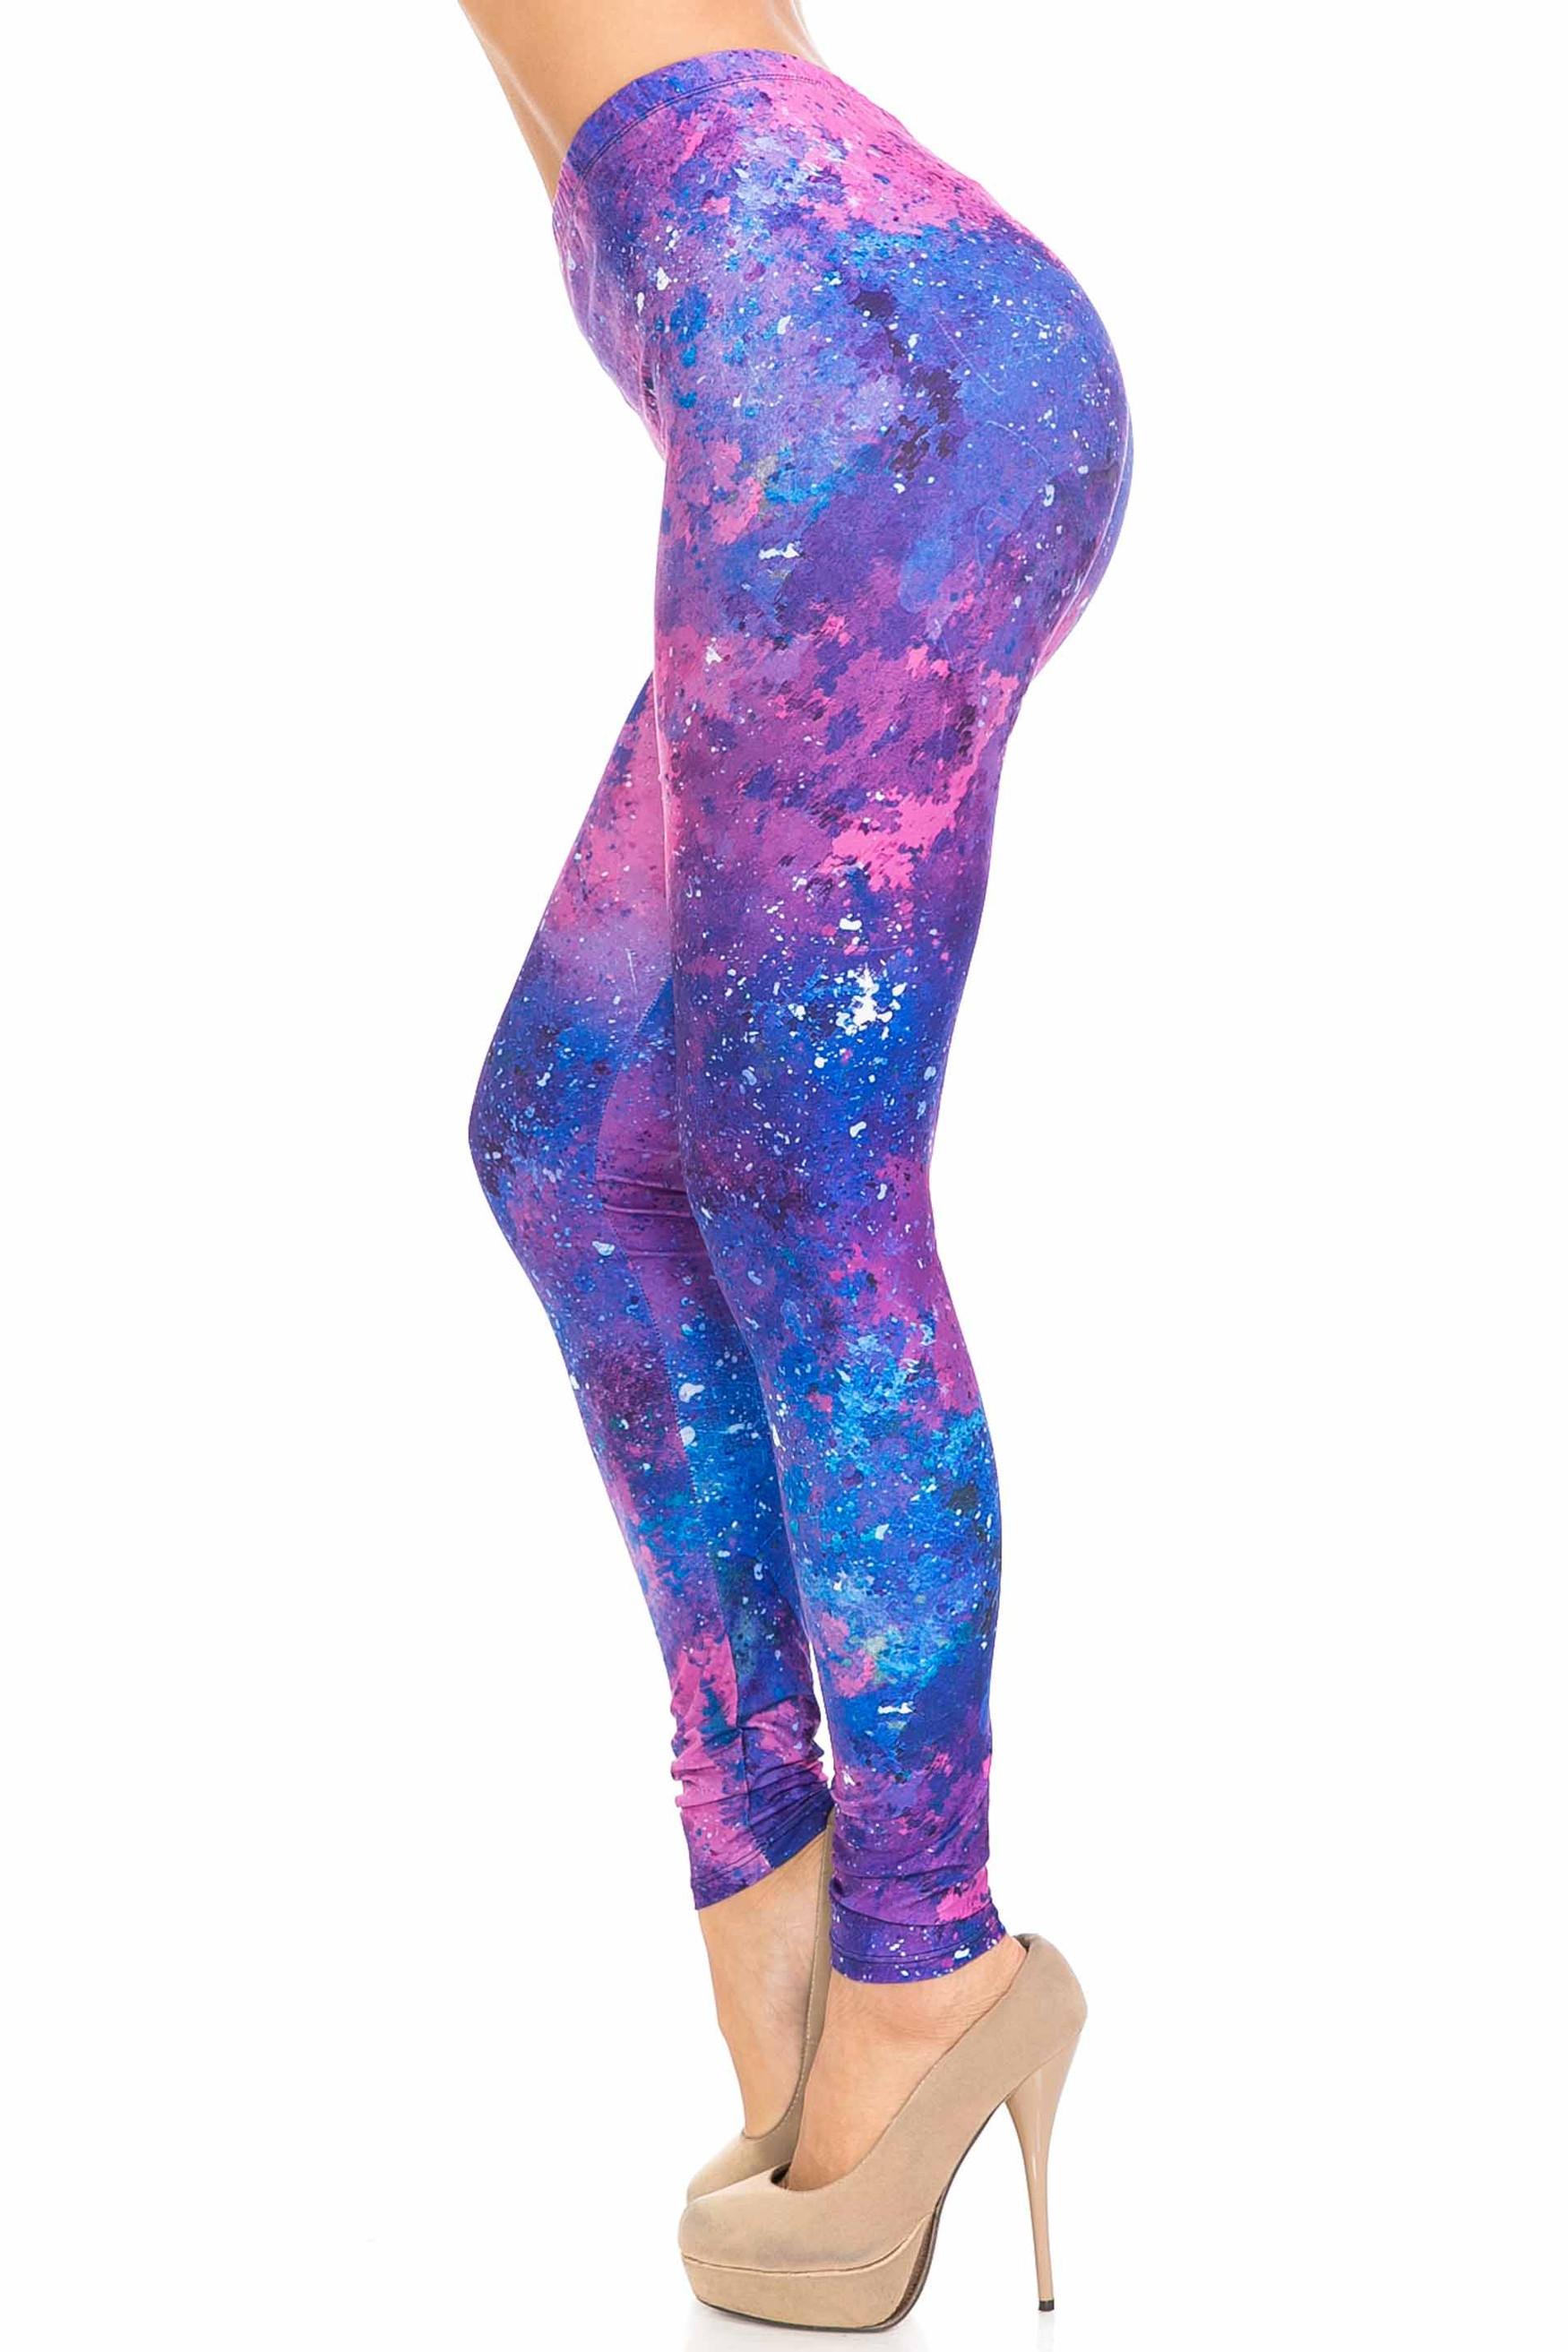 Left side image of Creamy Soft Blue Fuchsia Nebula Leggings - USA Fashion™